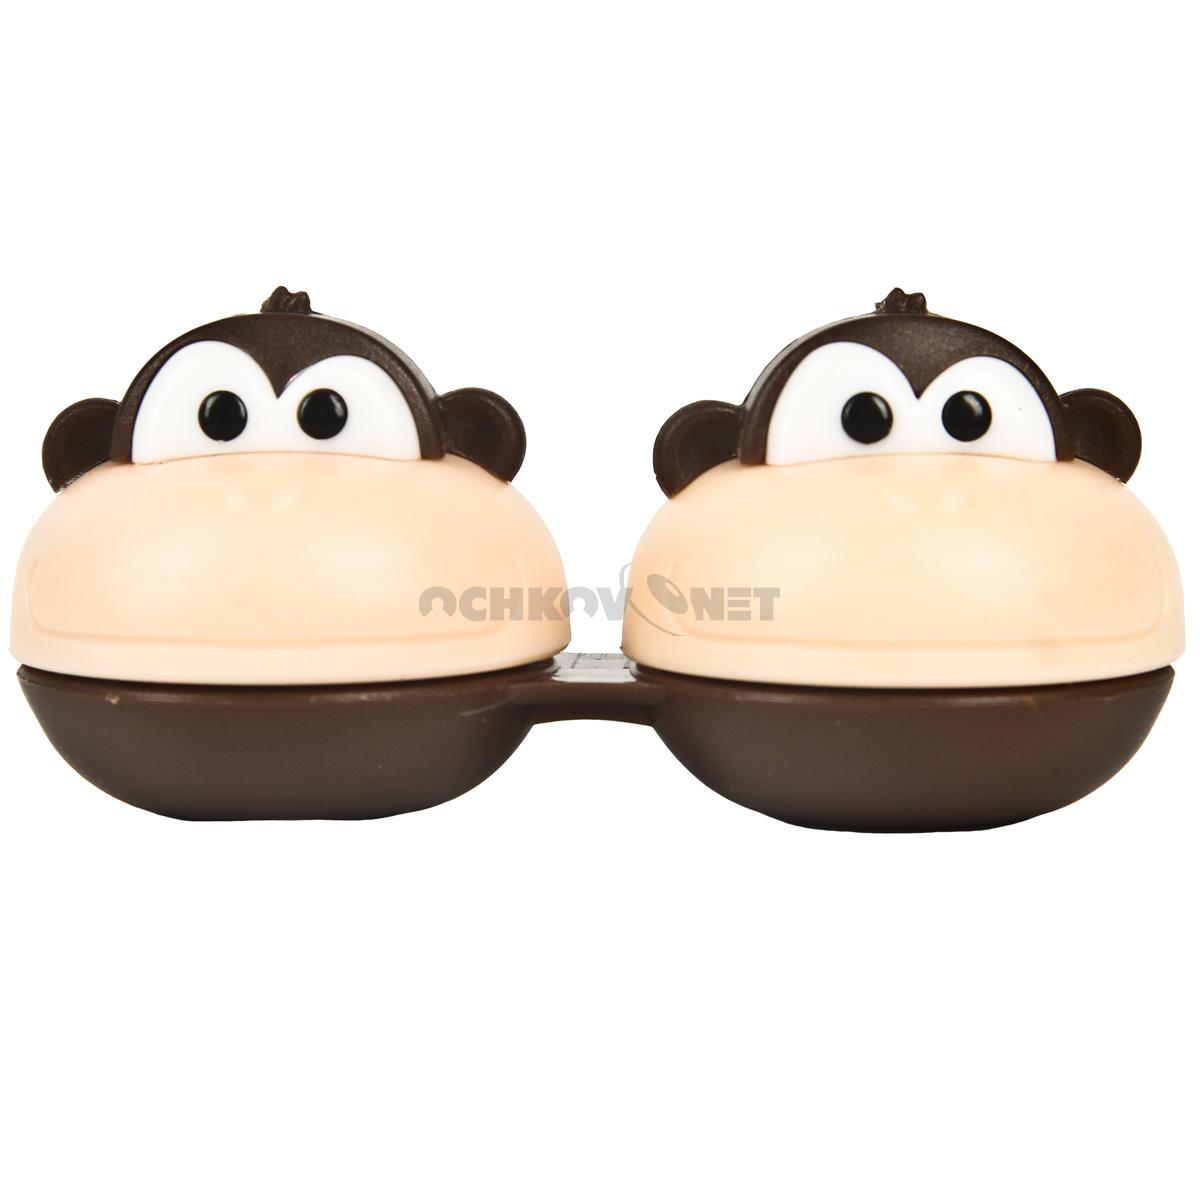 Контейнер MIO FRIENDS - контейнер для линз (обезьянка) + пинцет